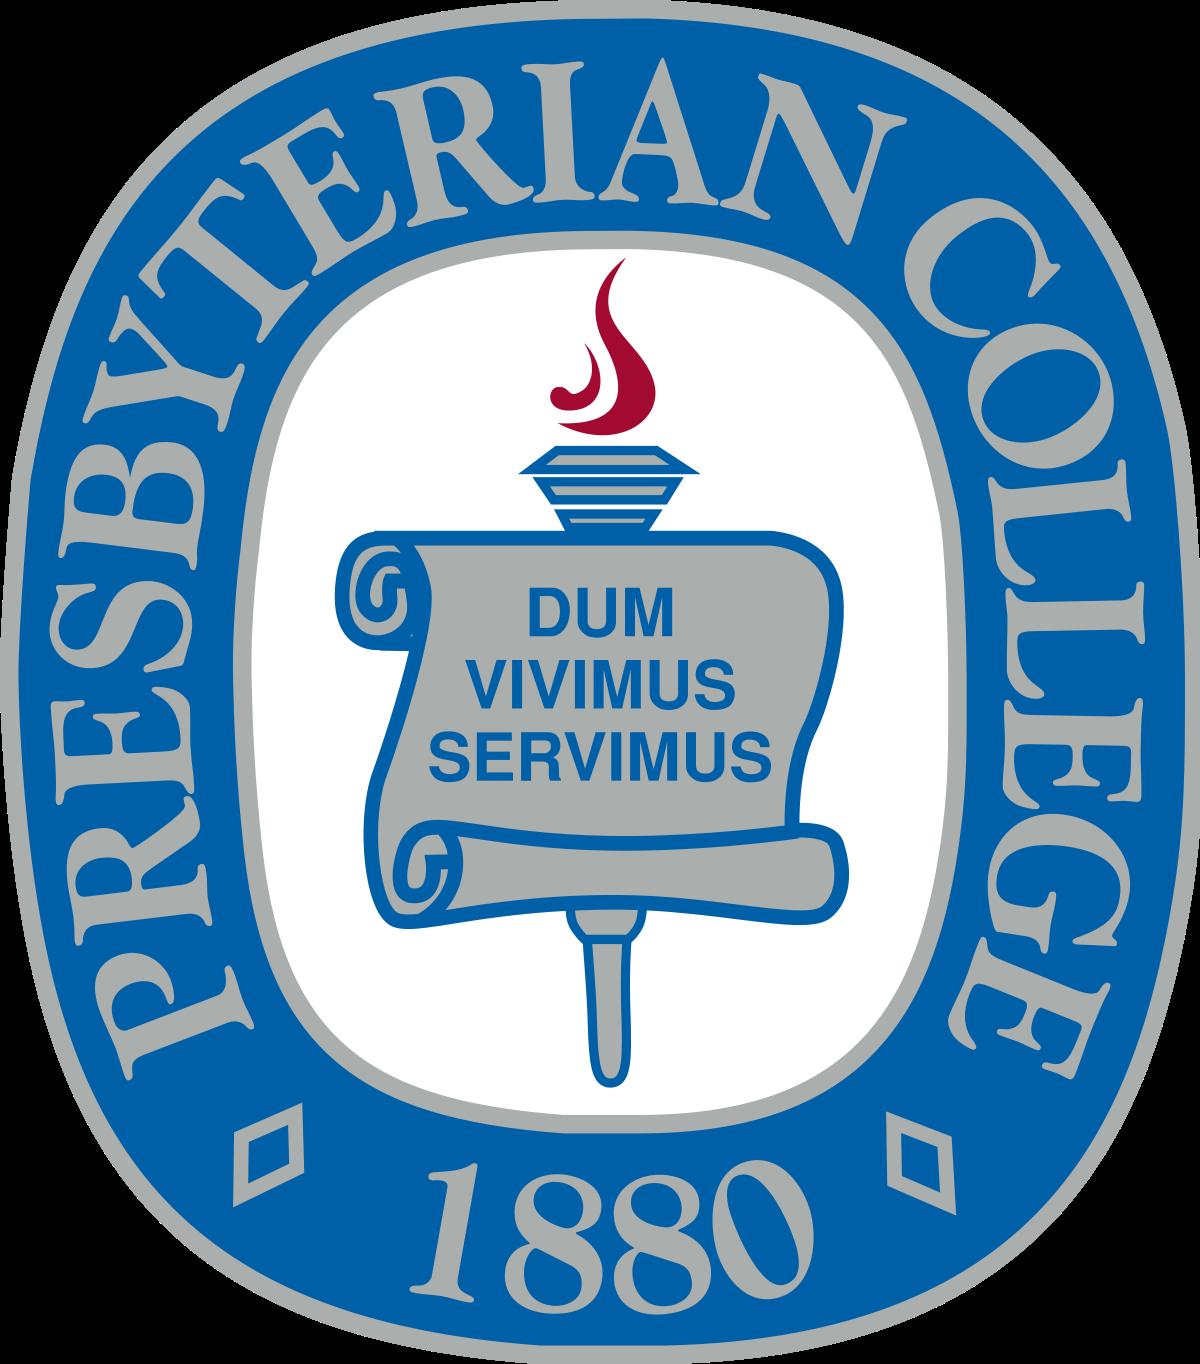 Presbyterian College.